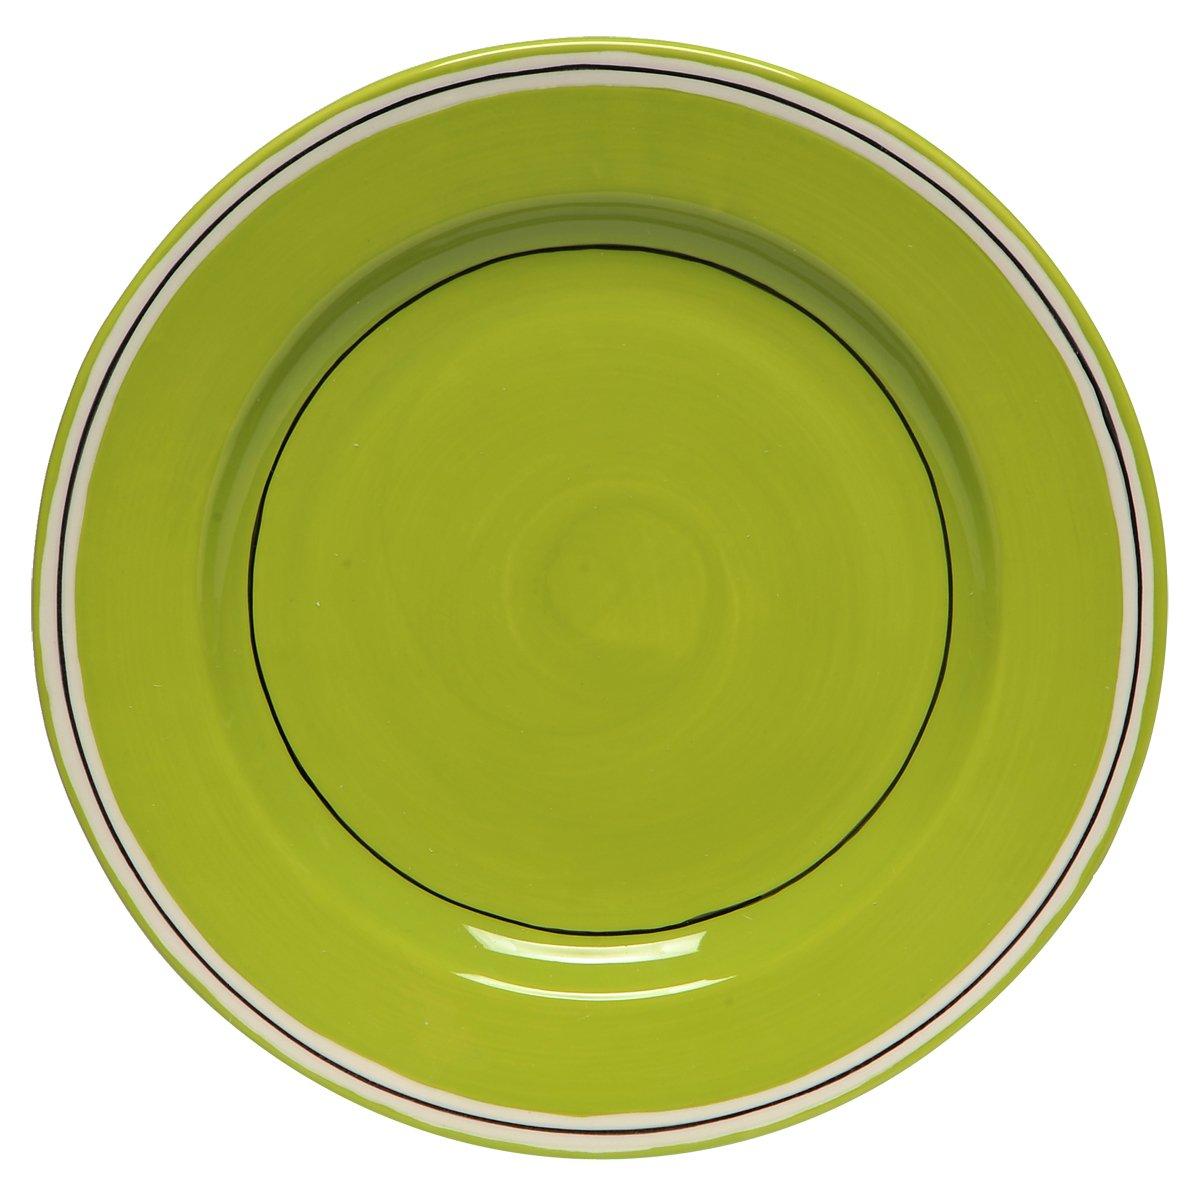 Thompson & Elm M. Bagwell Colors Ceramic Salad Plates (Set of 4), Lime Green MB825309FAGR